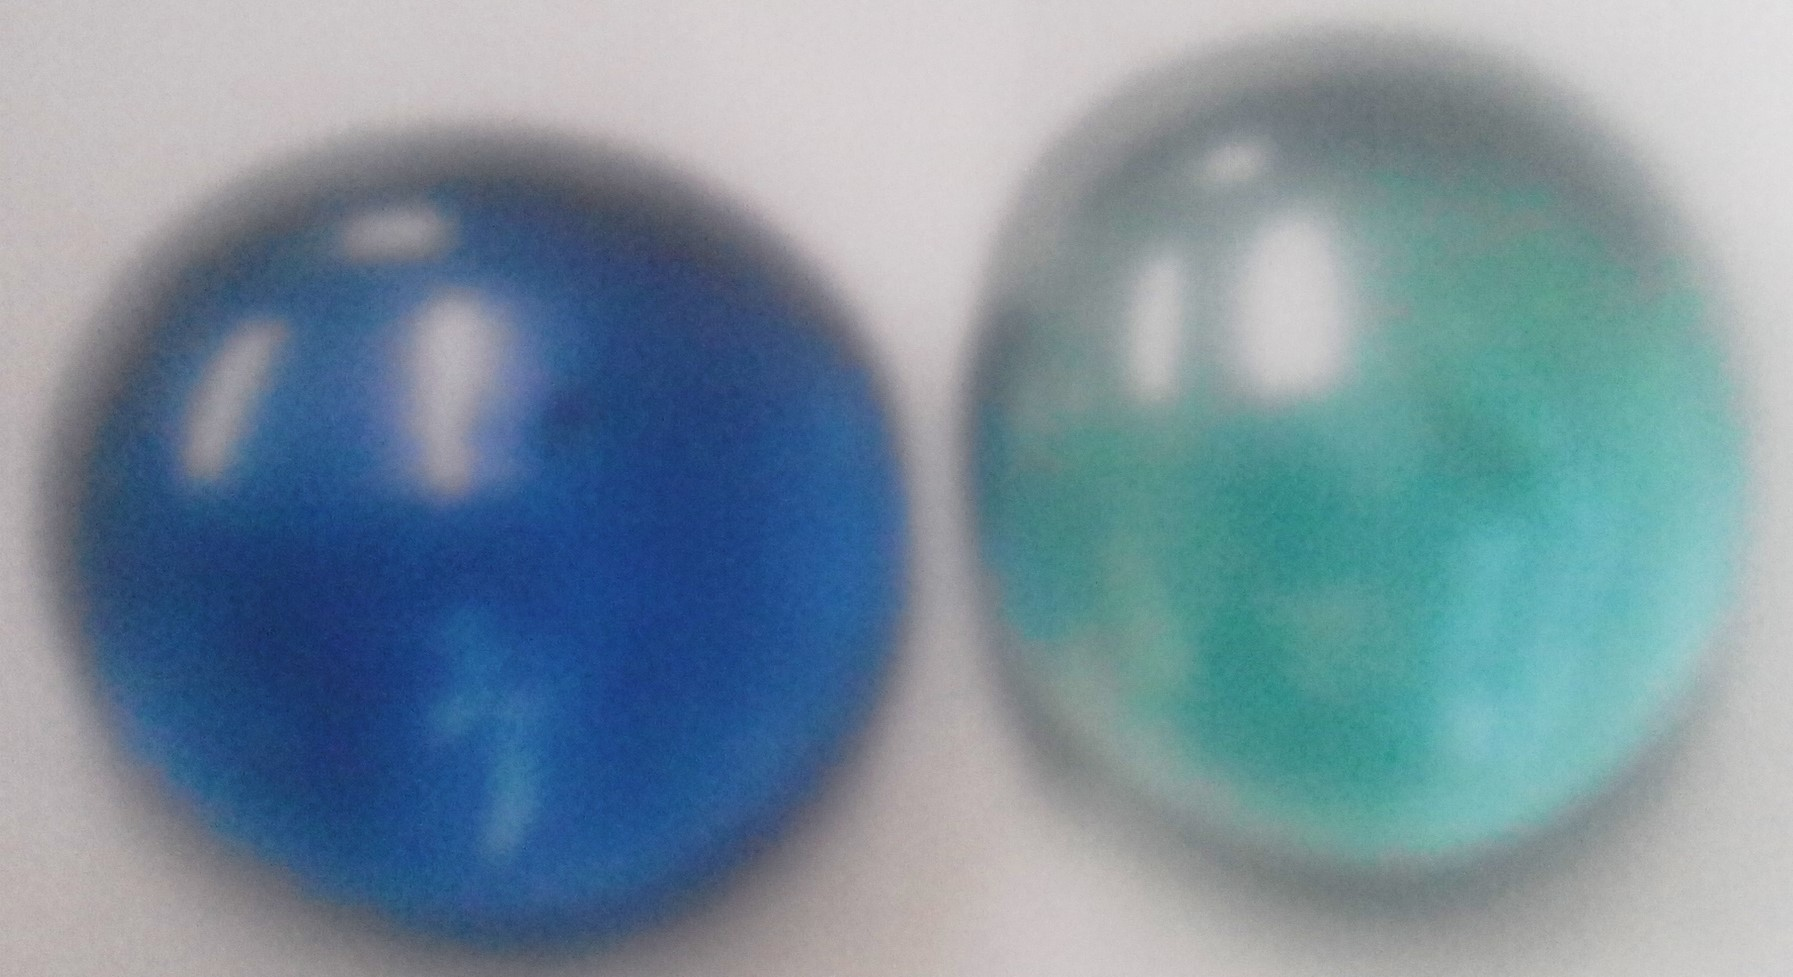 Quartz clear blueish glass